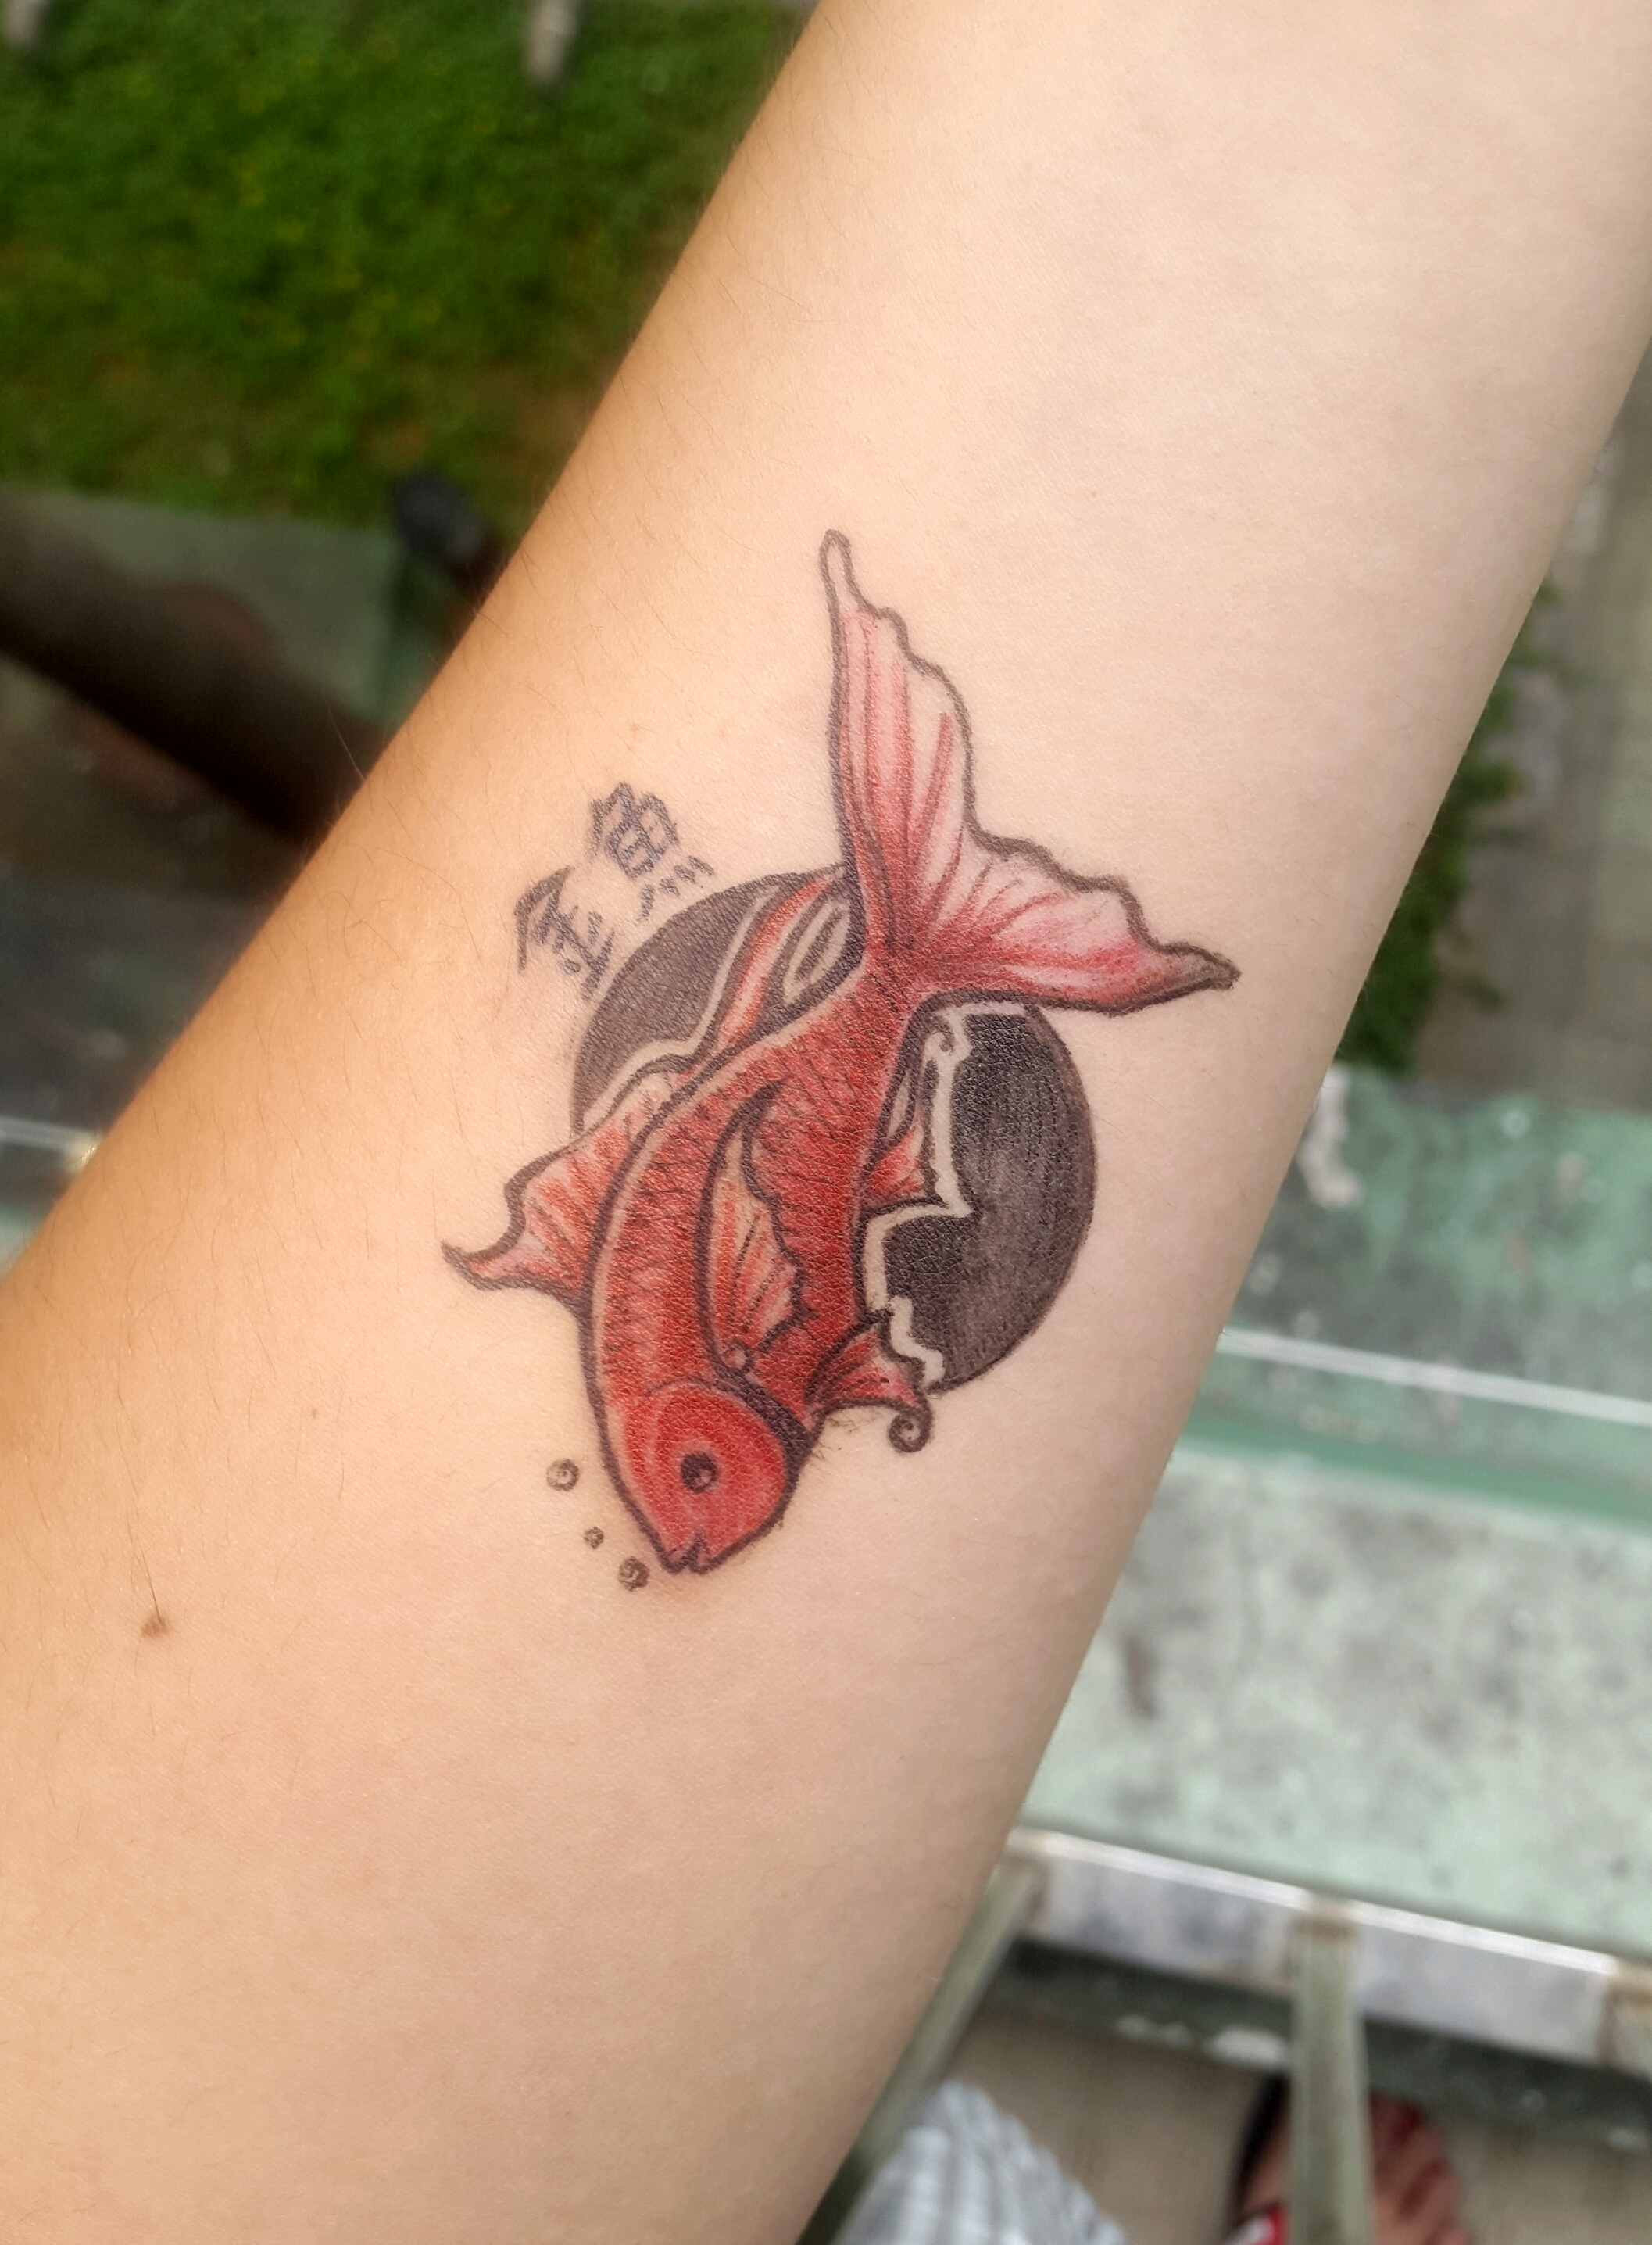 Hospital diy tattoo 2